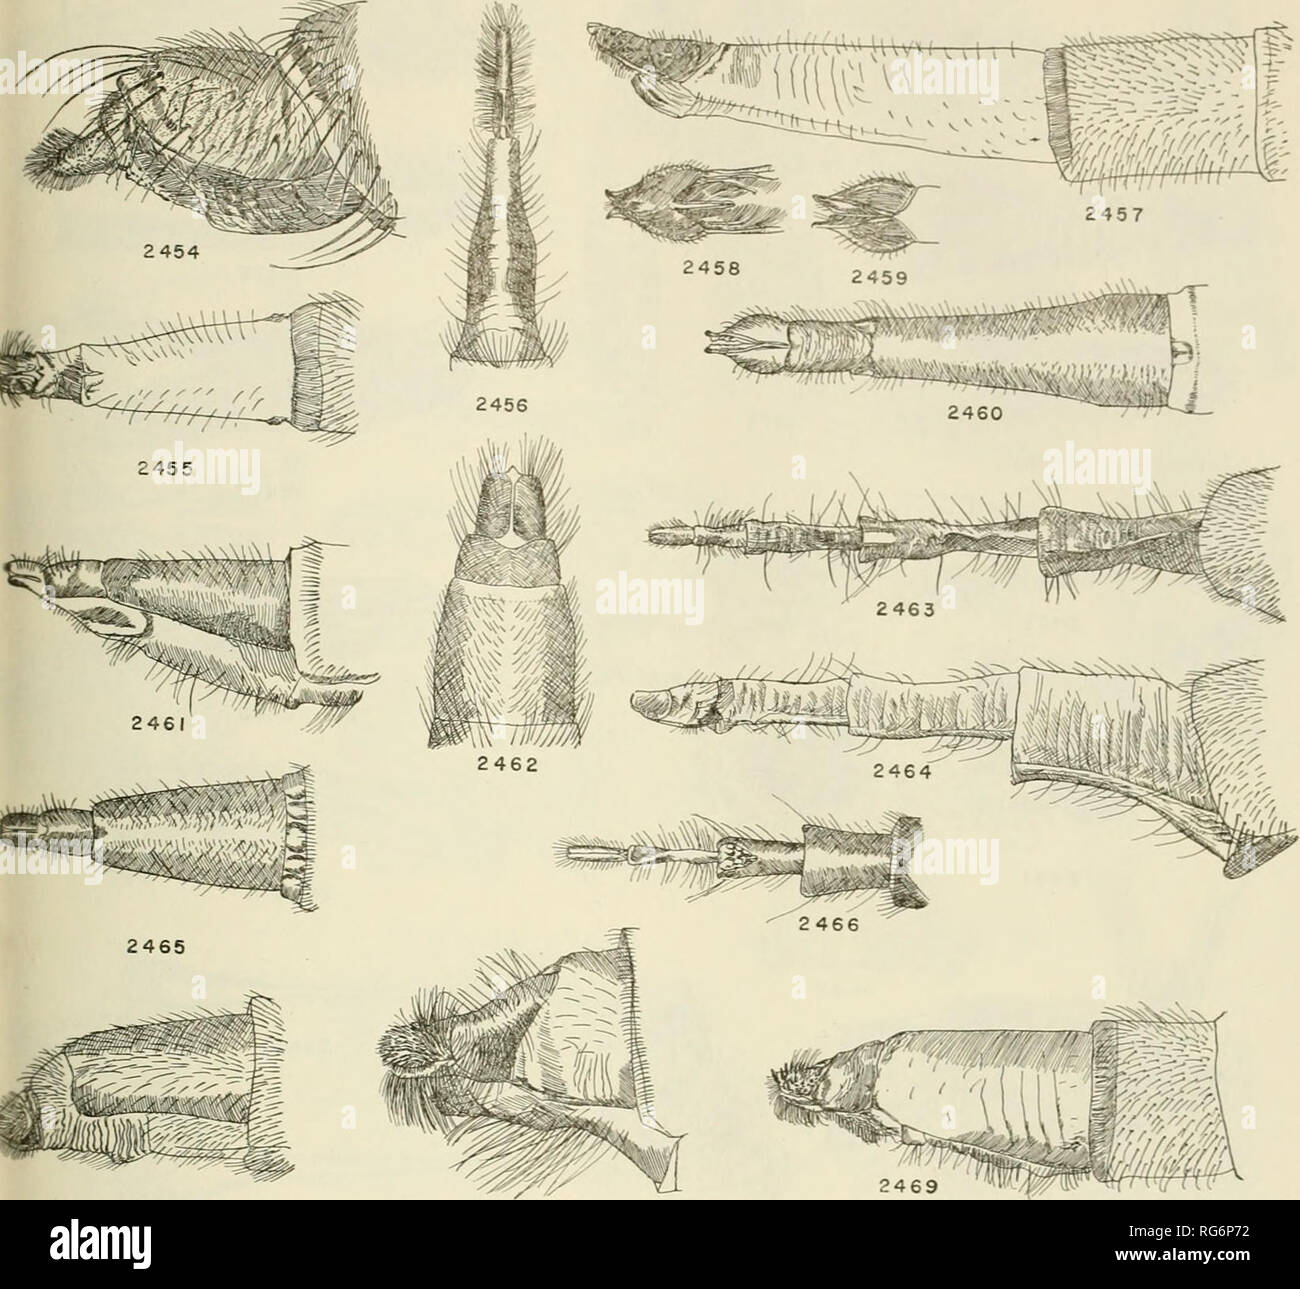 . Bulletin - United States National Museum. Science. ROBBER FLIES OF THE WORLD 807. 2467 2466 Figures 2454-2469.—Females. 2454, Cratopoda gayi Macquart. 2455, Cratolestes spectabilis Phi- lippi. 2456, Senoprosopis tenuis Wiedemann, type. 2457, Apotinocerus brevistylatus Wulp, 2458, Apotinocerus brevistylatus Wulp, dorsal apex. 2459, Apotinocerus brevistylatus Wulp, ventral apex. 2460, Apotinocerus brevistylatus Wulp, dorsal aspect. 2461, Asilus crabroniformis Linne. 2462, Glaphyropyga himantocera Wiedemann. 2463, Nyssomyia ochracea, new species. 2464, Nyssomyia ochracea, new species. 2465, Asi - Stock Image